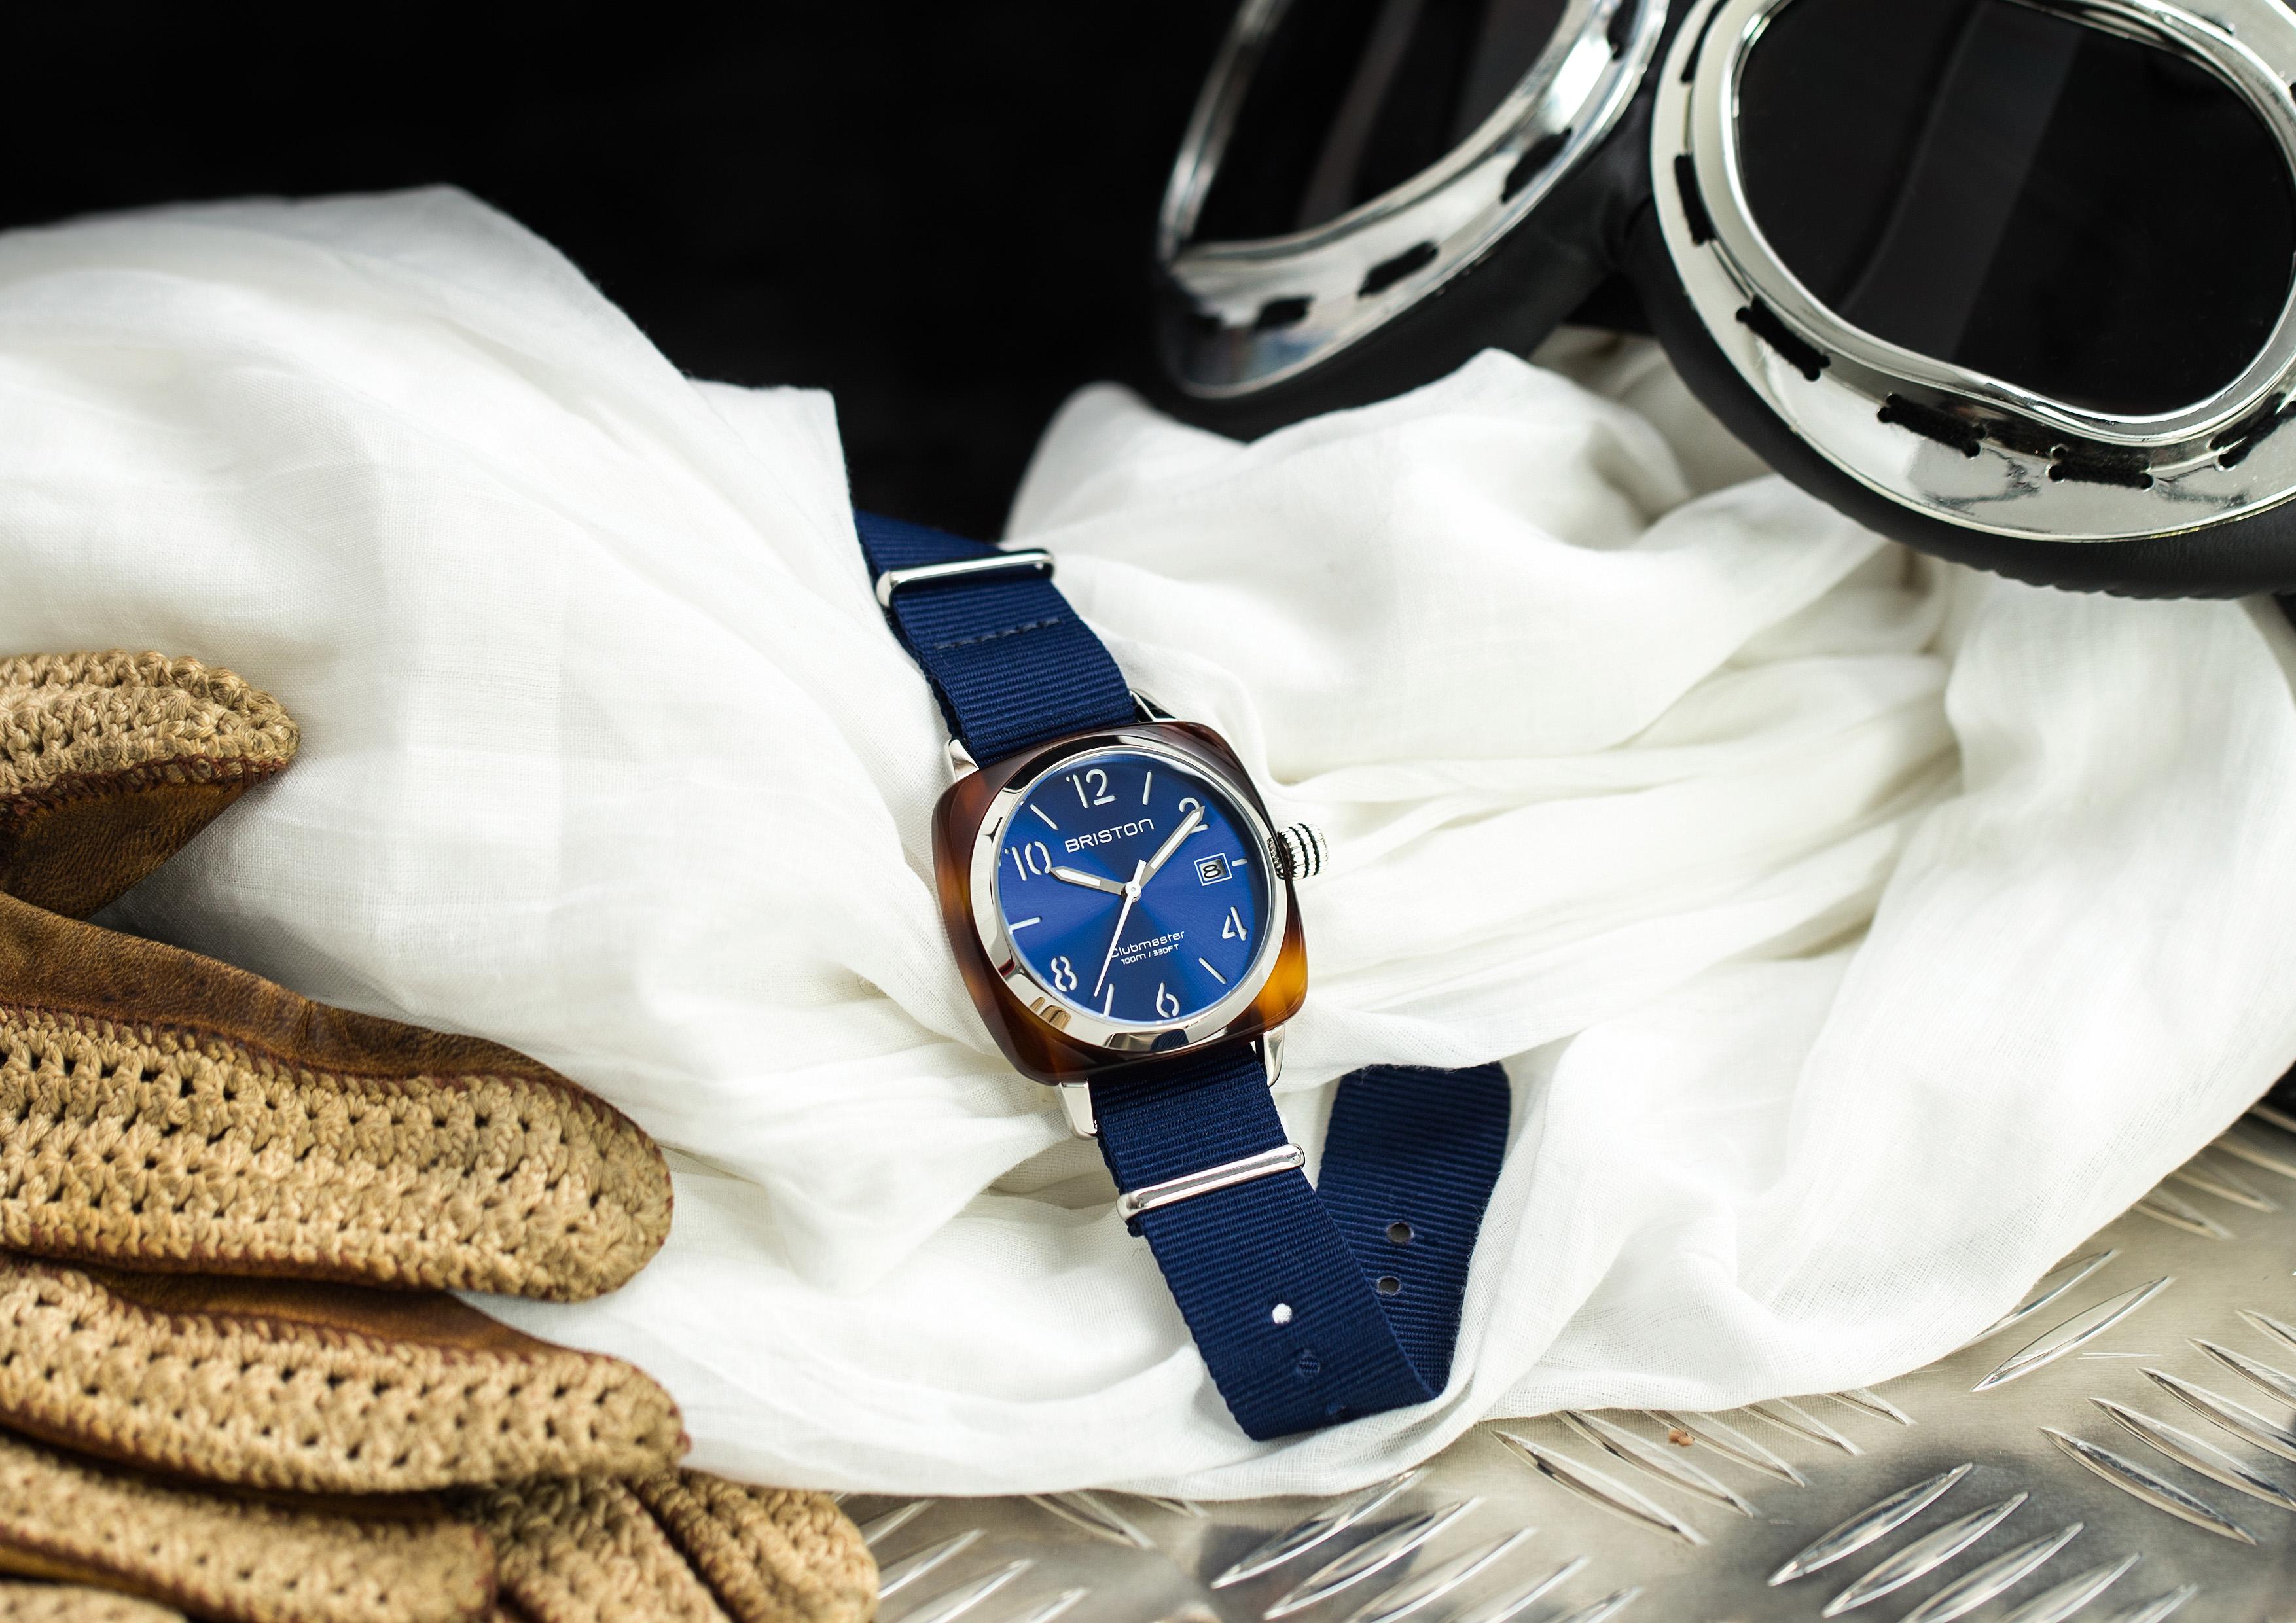 Briston-Photo-univers-clubmaster-classic-ecaille-cadran-bleu-soleille-q